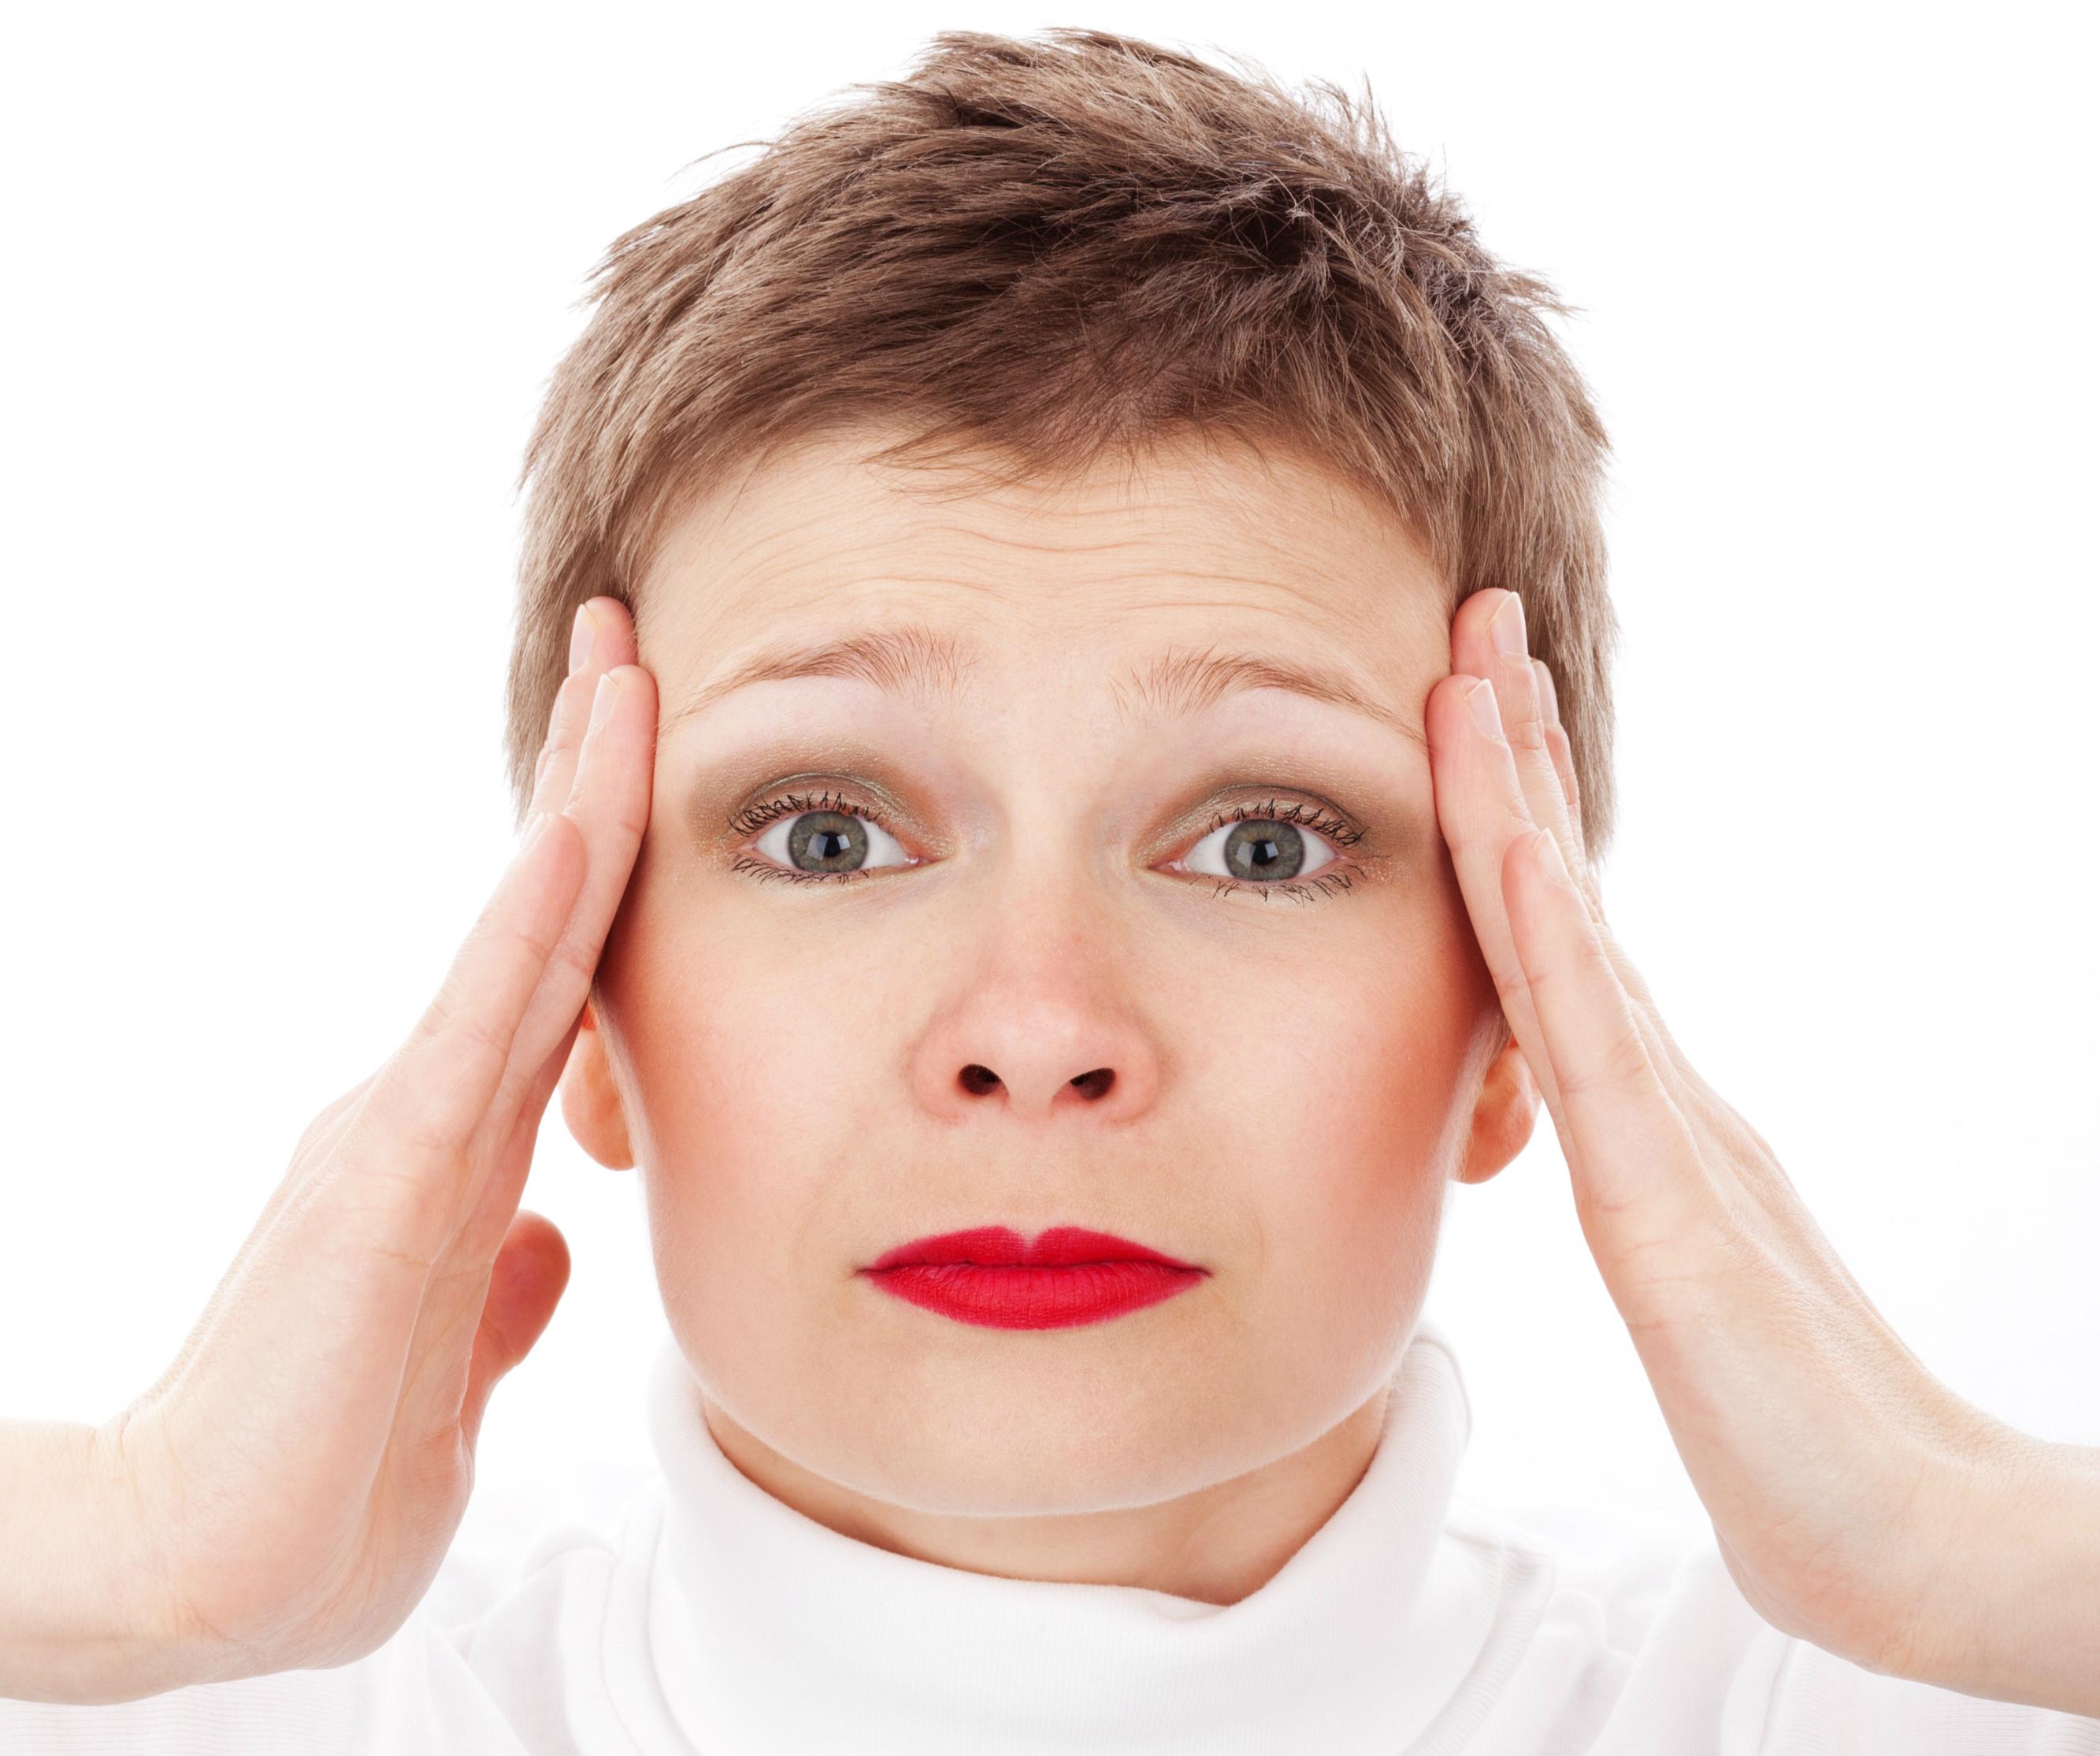 Calendario Menopausa.Menopausa Indotta Dalle Terapie Oncologiche Fraparentesi